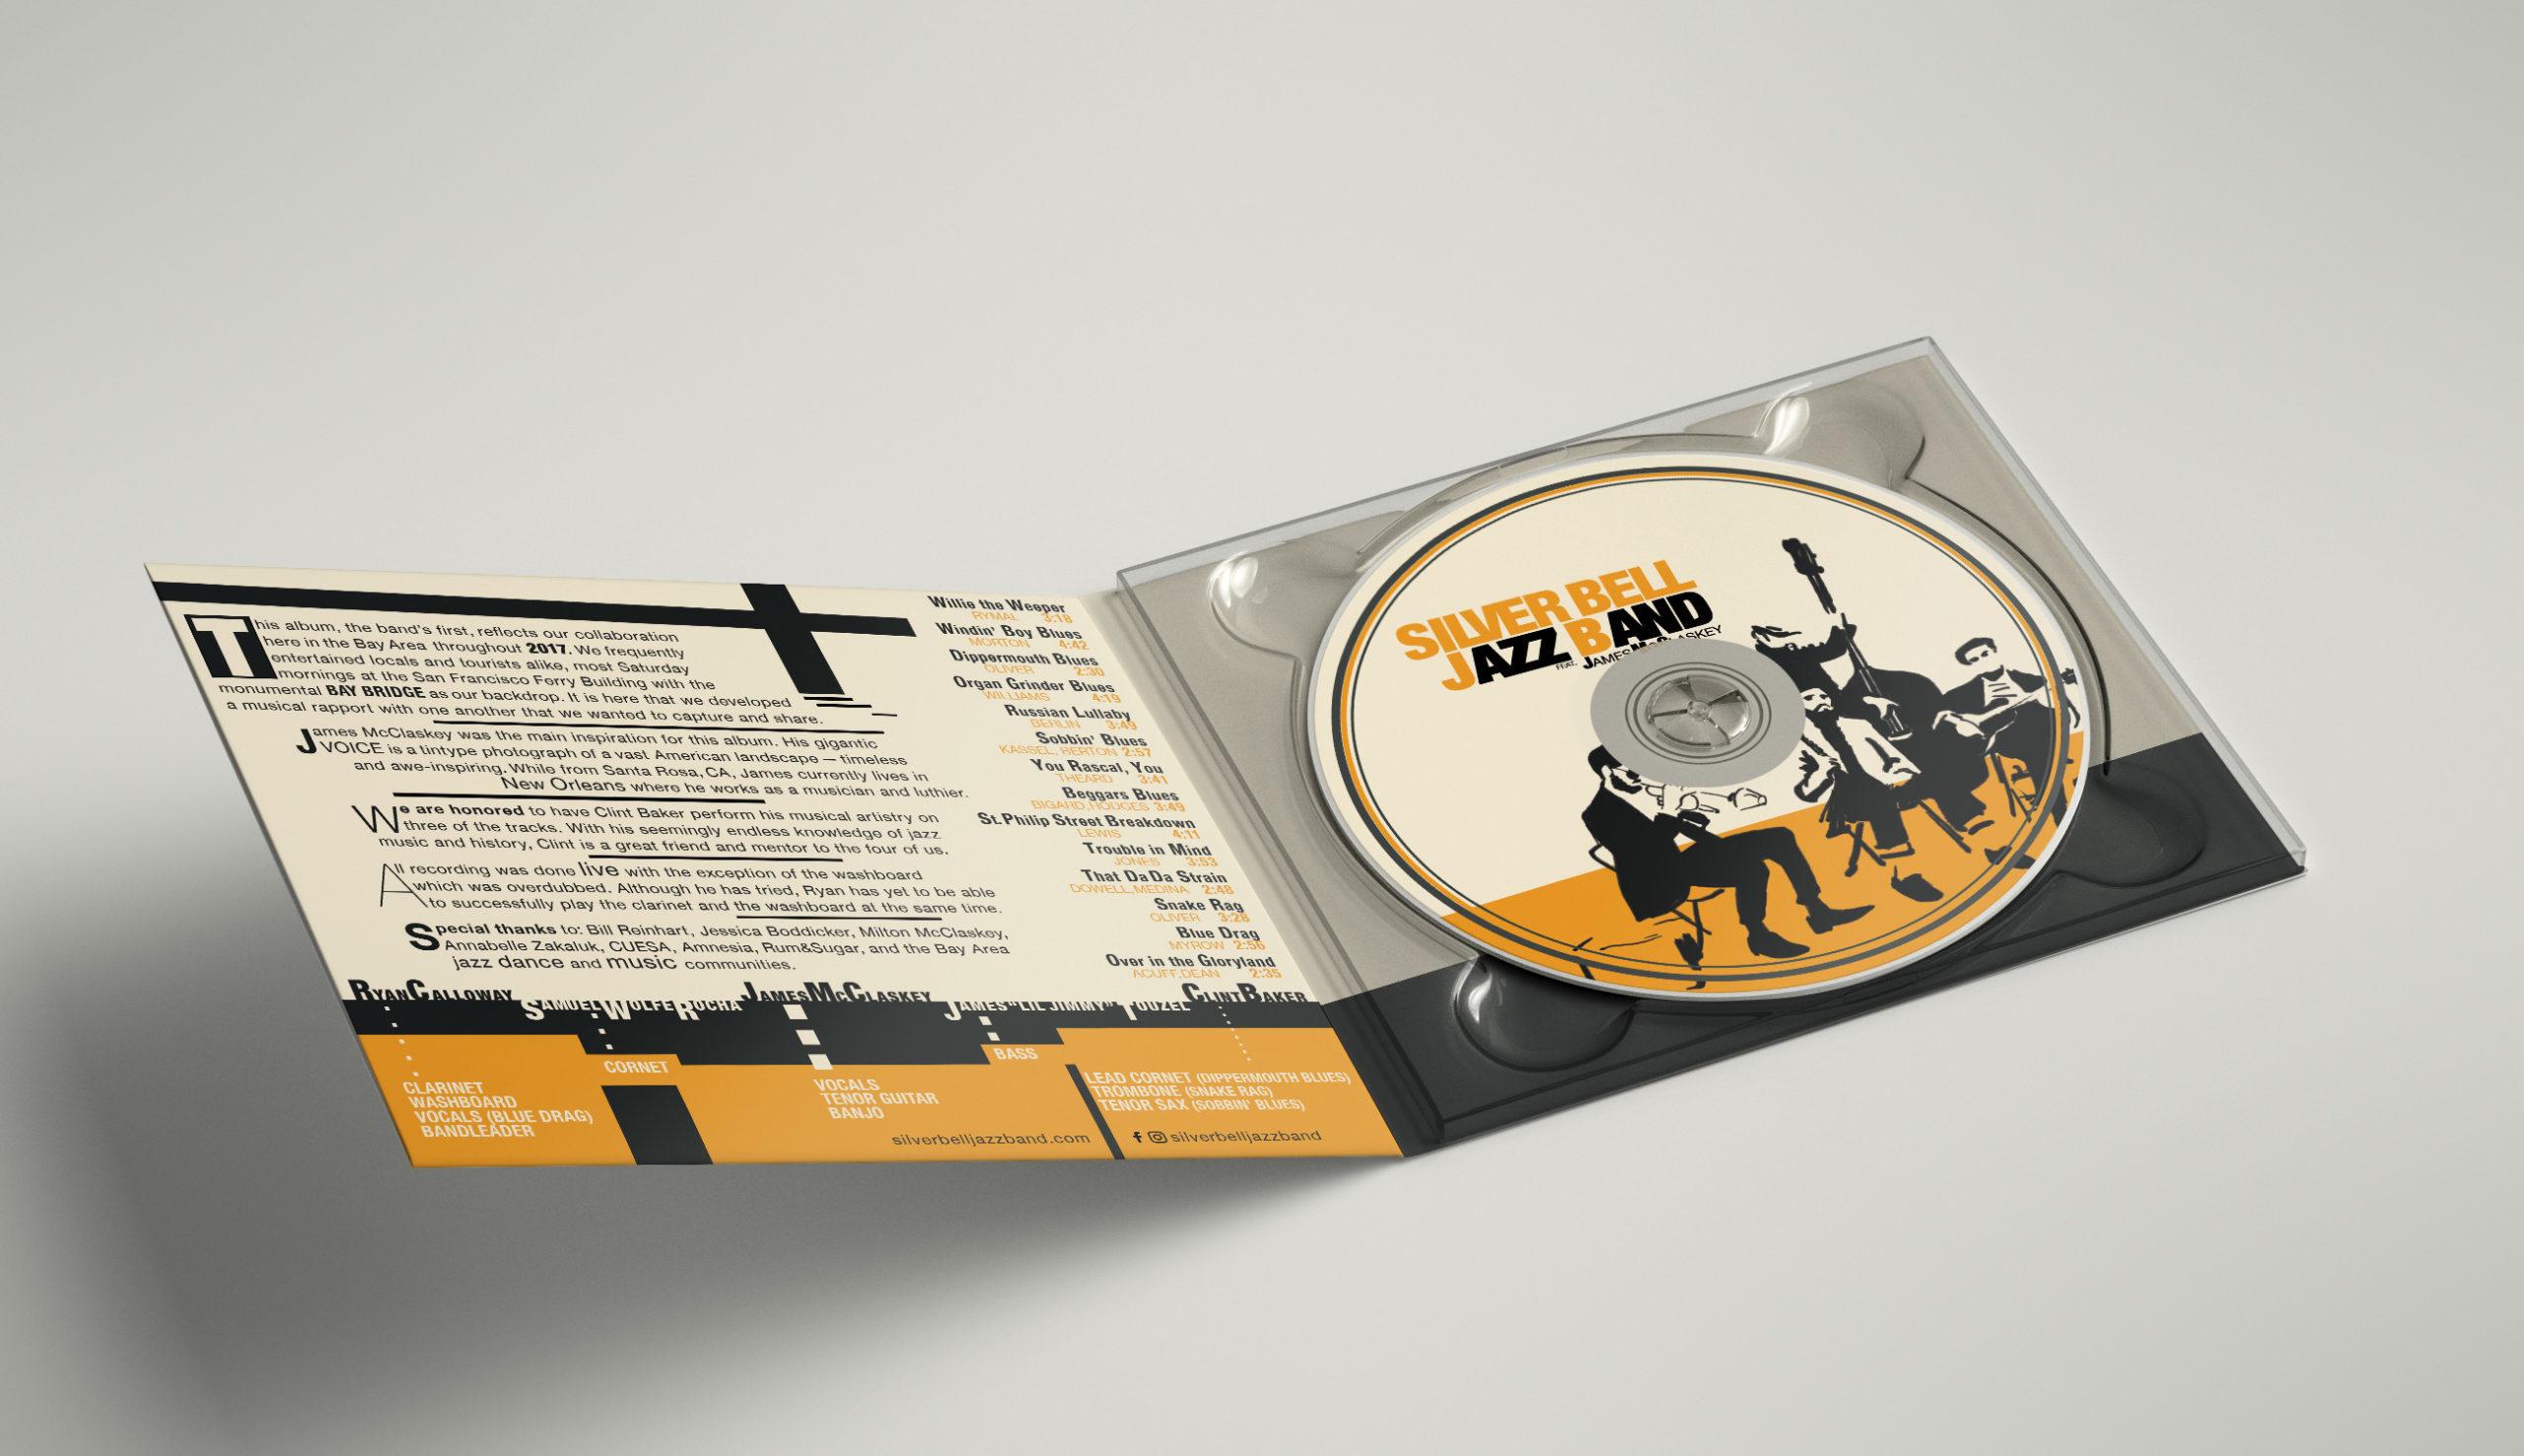 Silver Bell Jazz Band Final ALbum Design